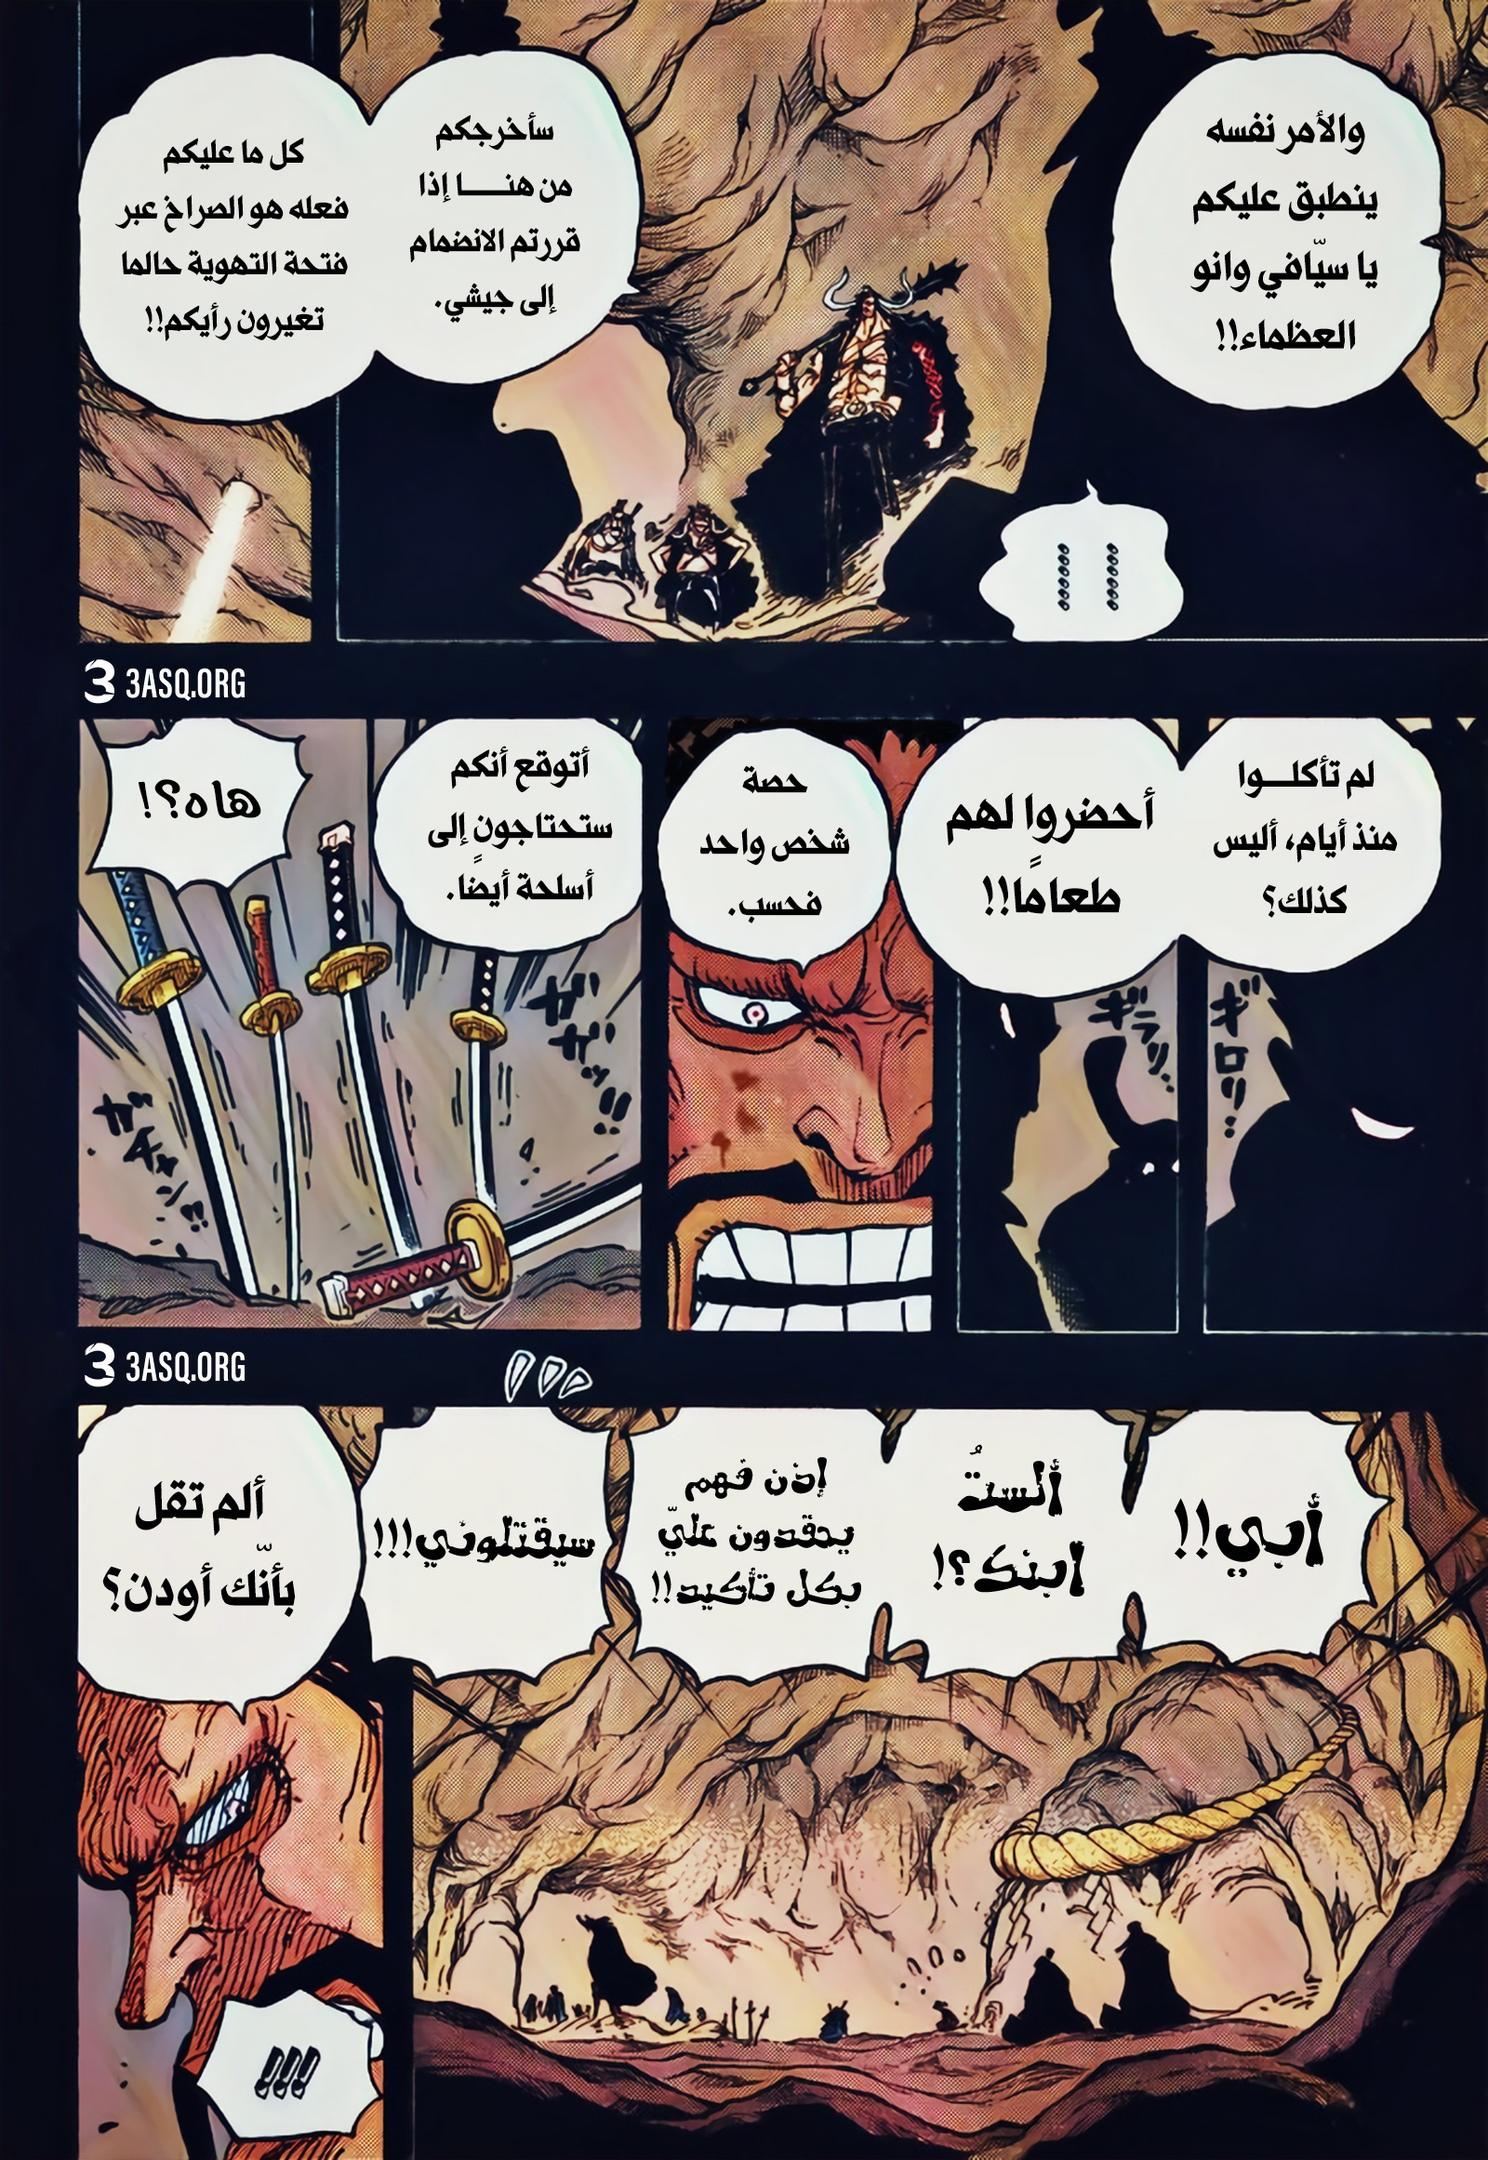 One Piece Arab 1024, image №20